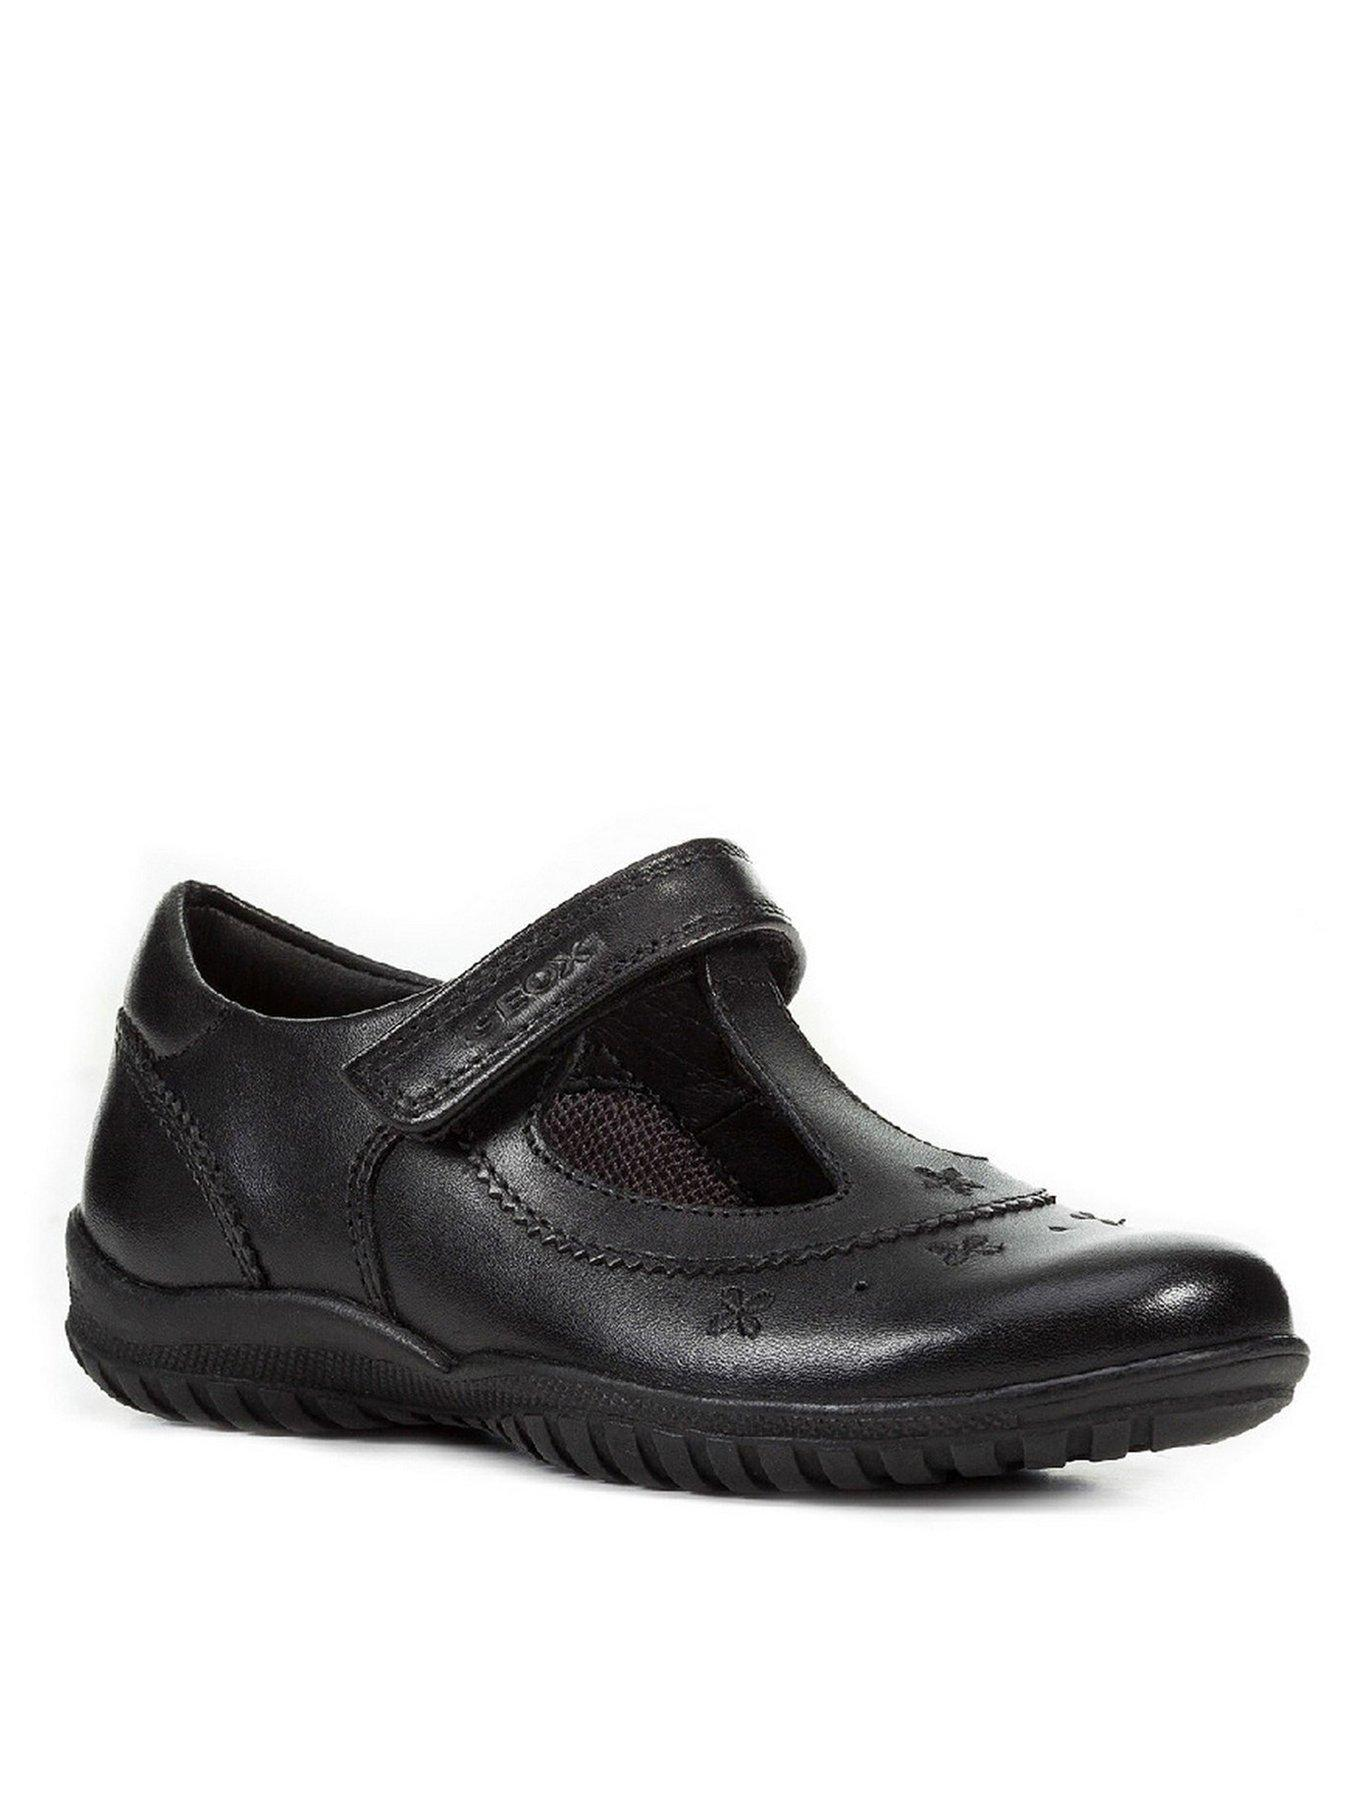 9 | School Shoes | Geox | School shoes